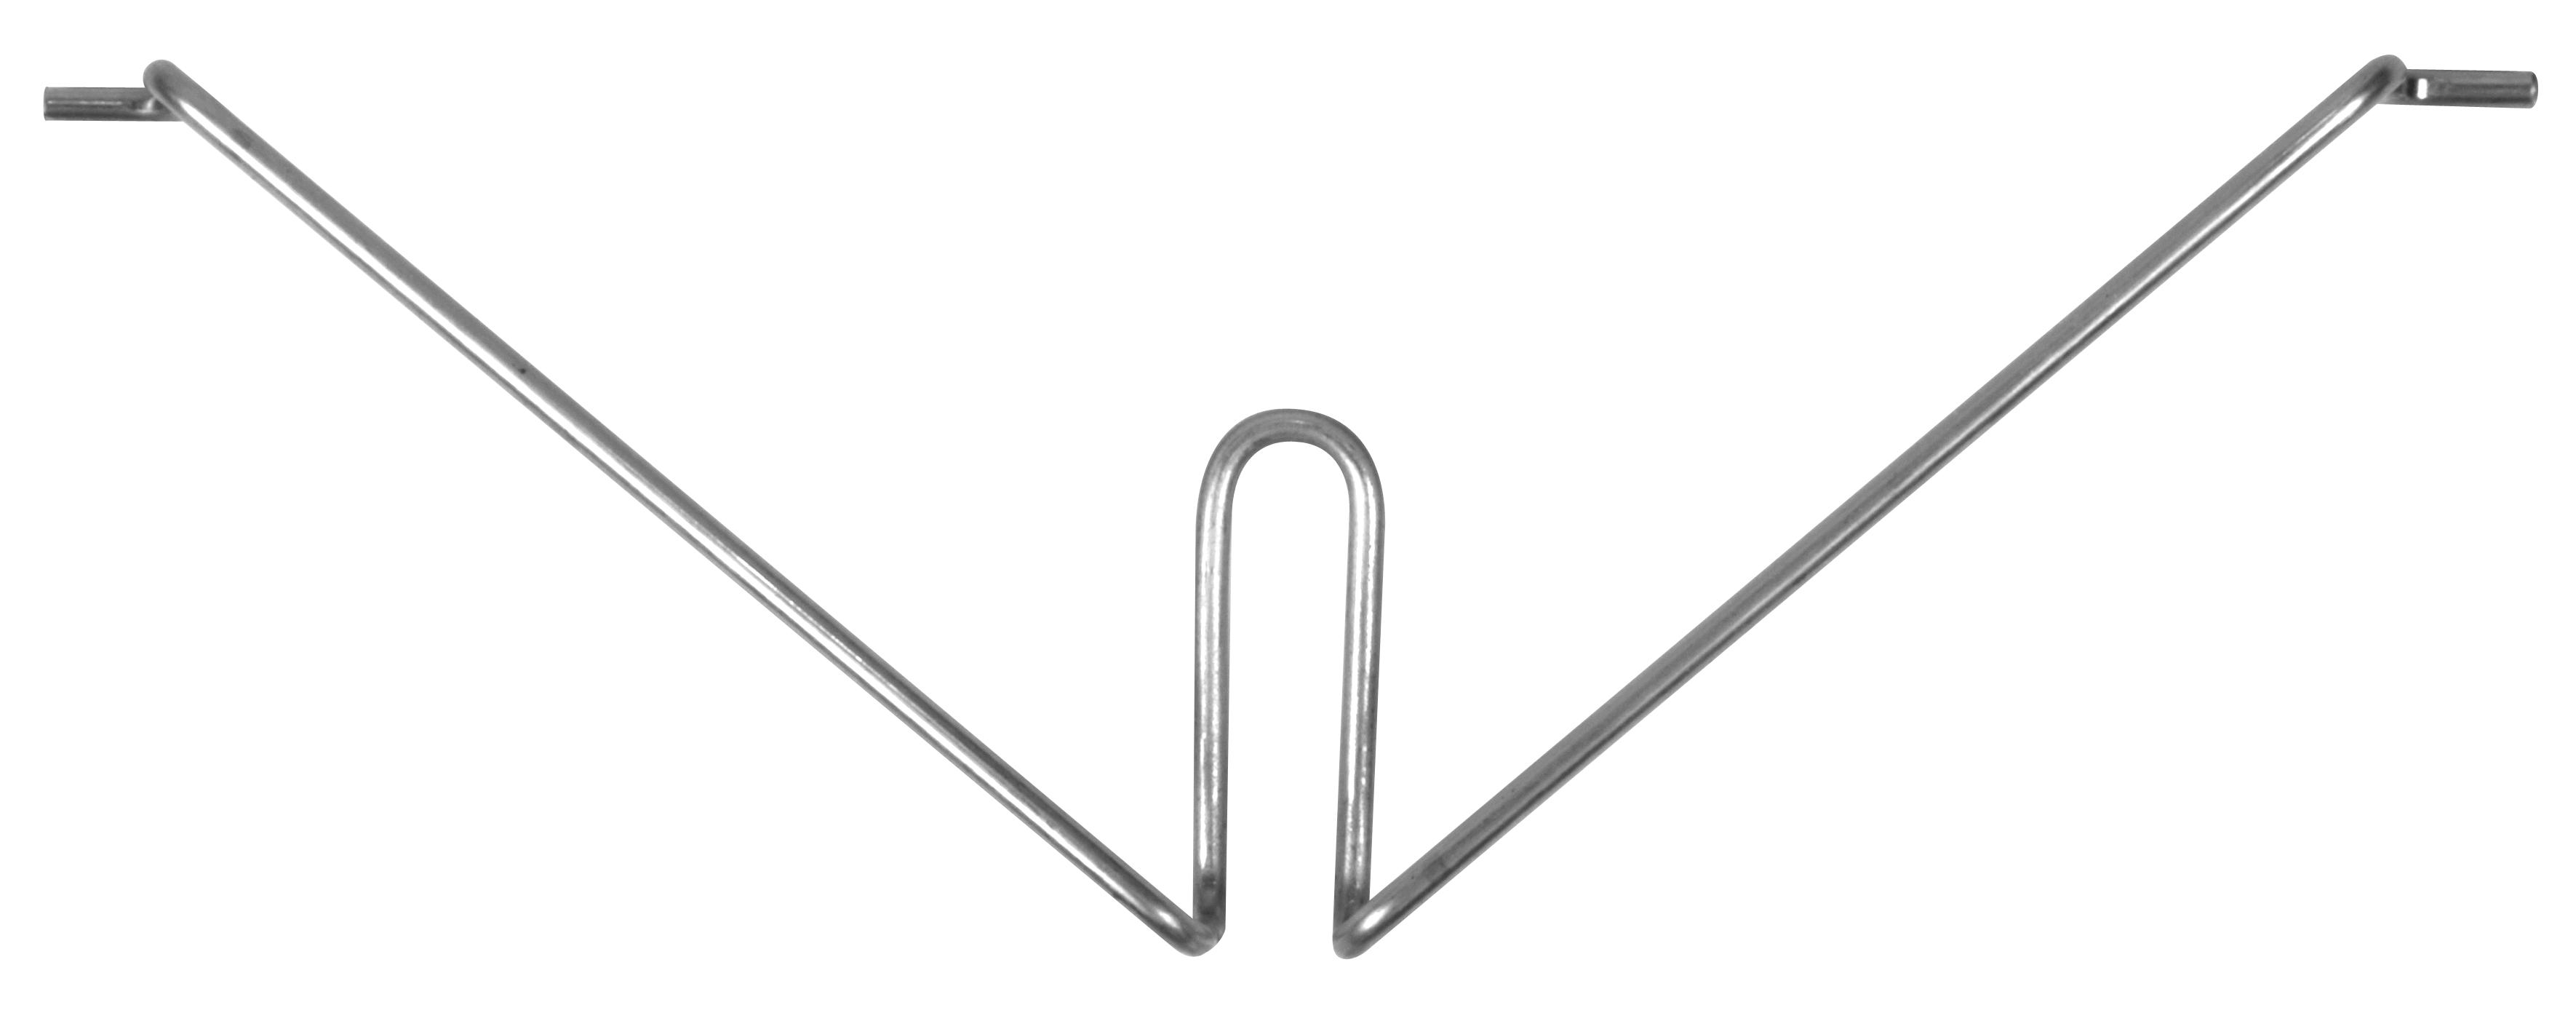 internal trunking clips